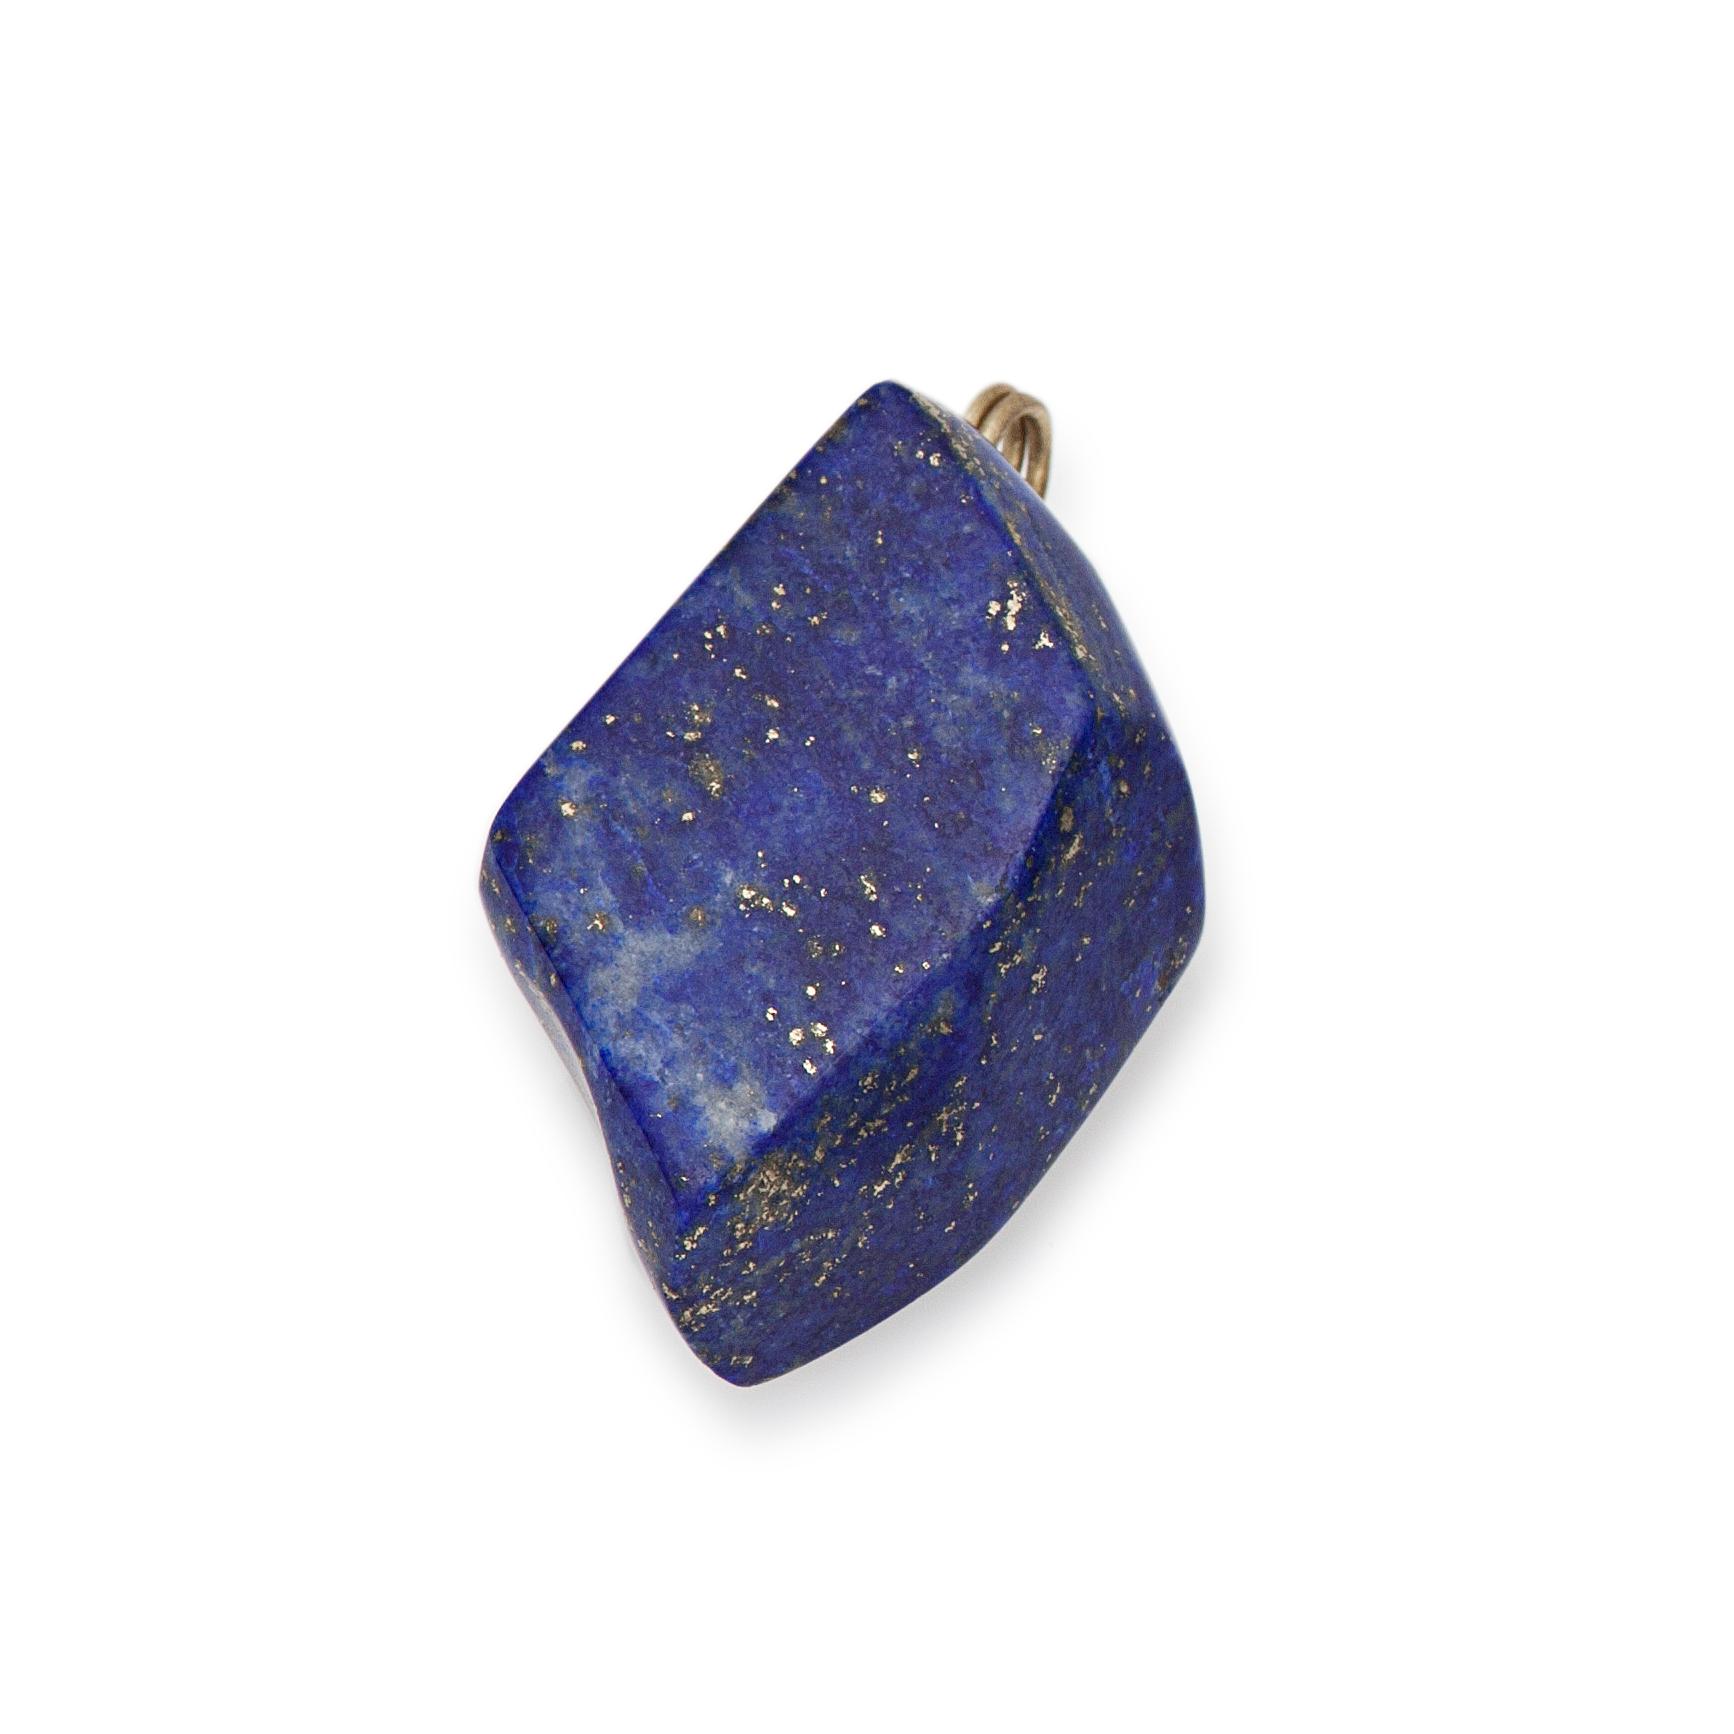 gundara-pendant-lapislazuli-blue-royal-protecting from the evil eye